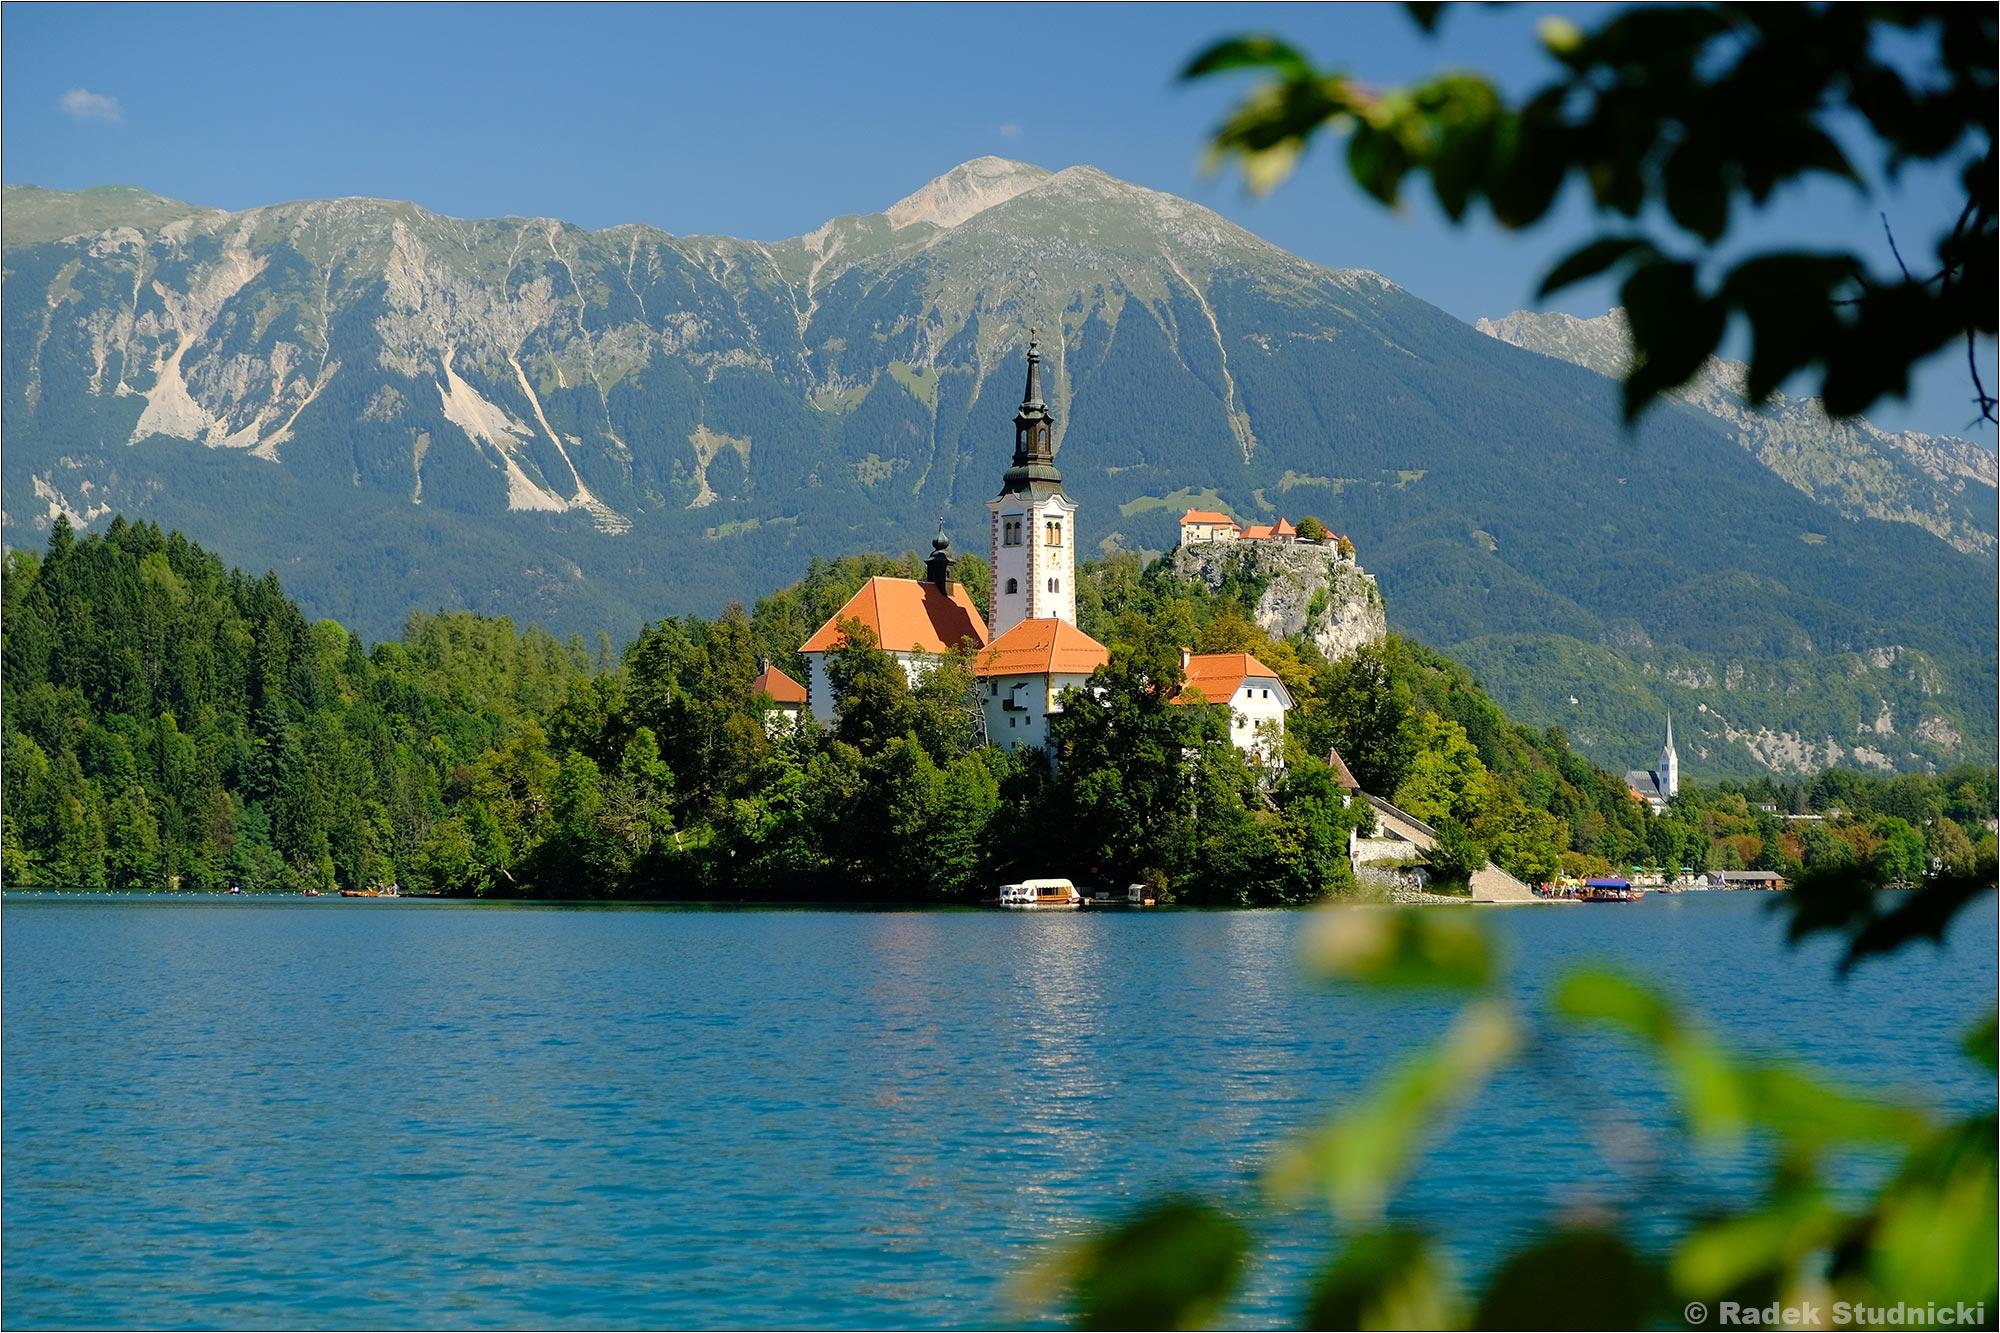 Jezioro Bledzkie